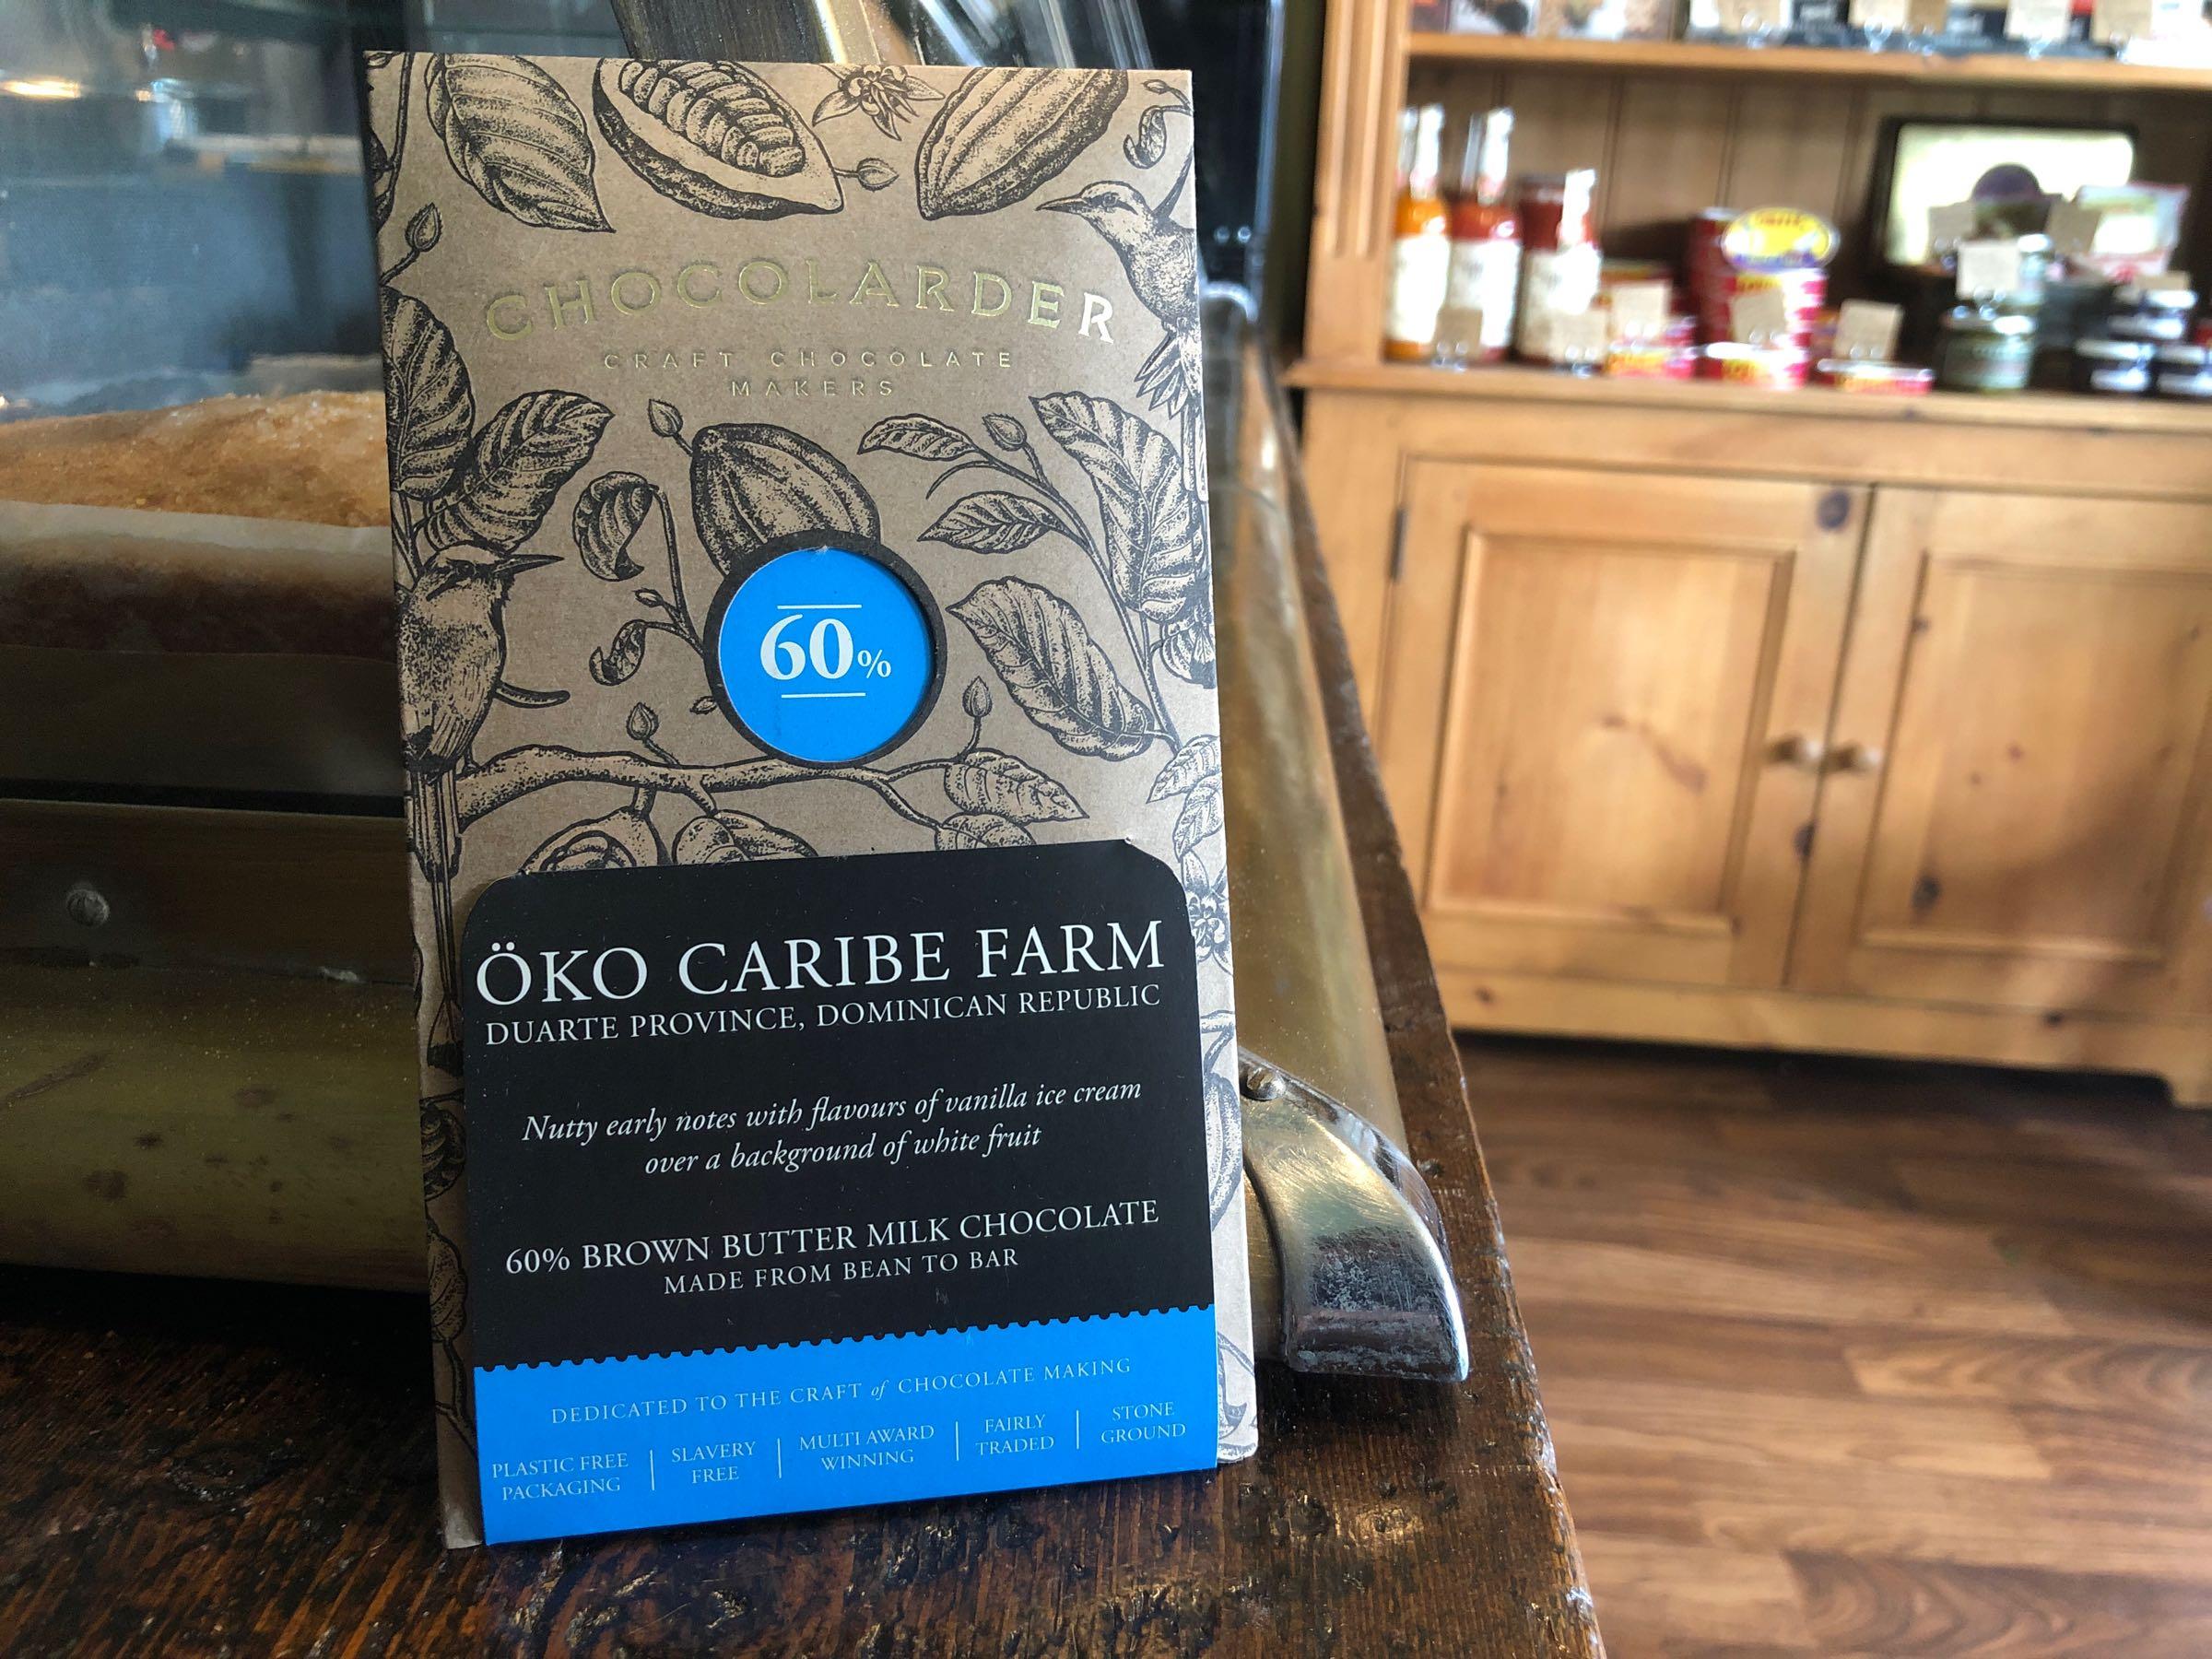 Chocolarder Oko Caribe Farm 55% Milk